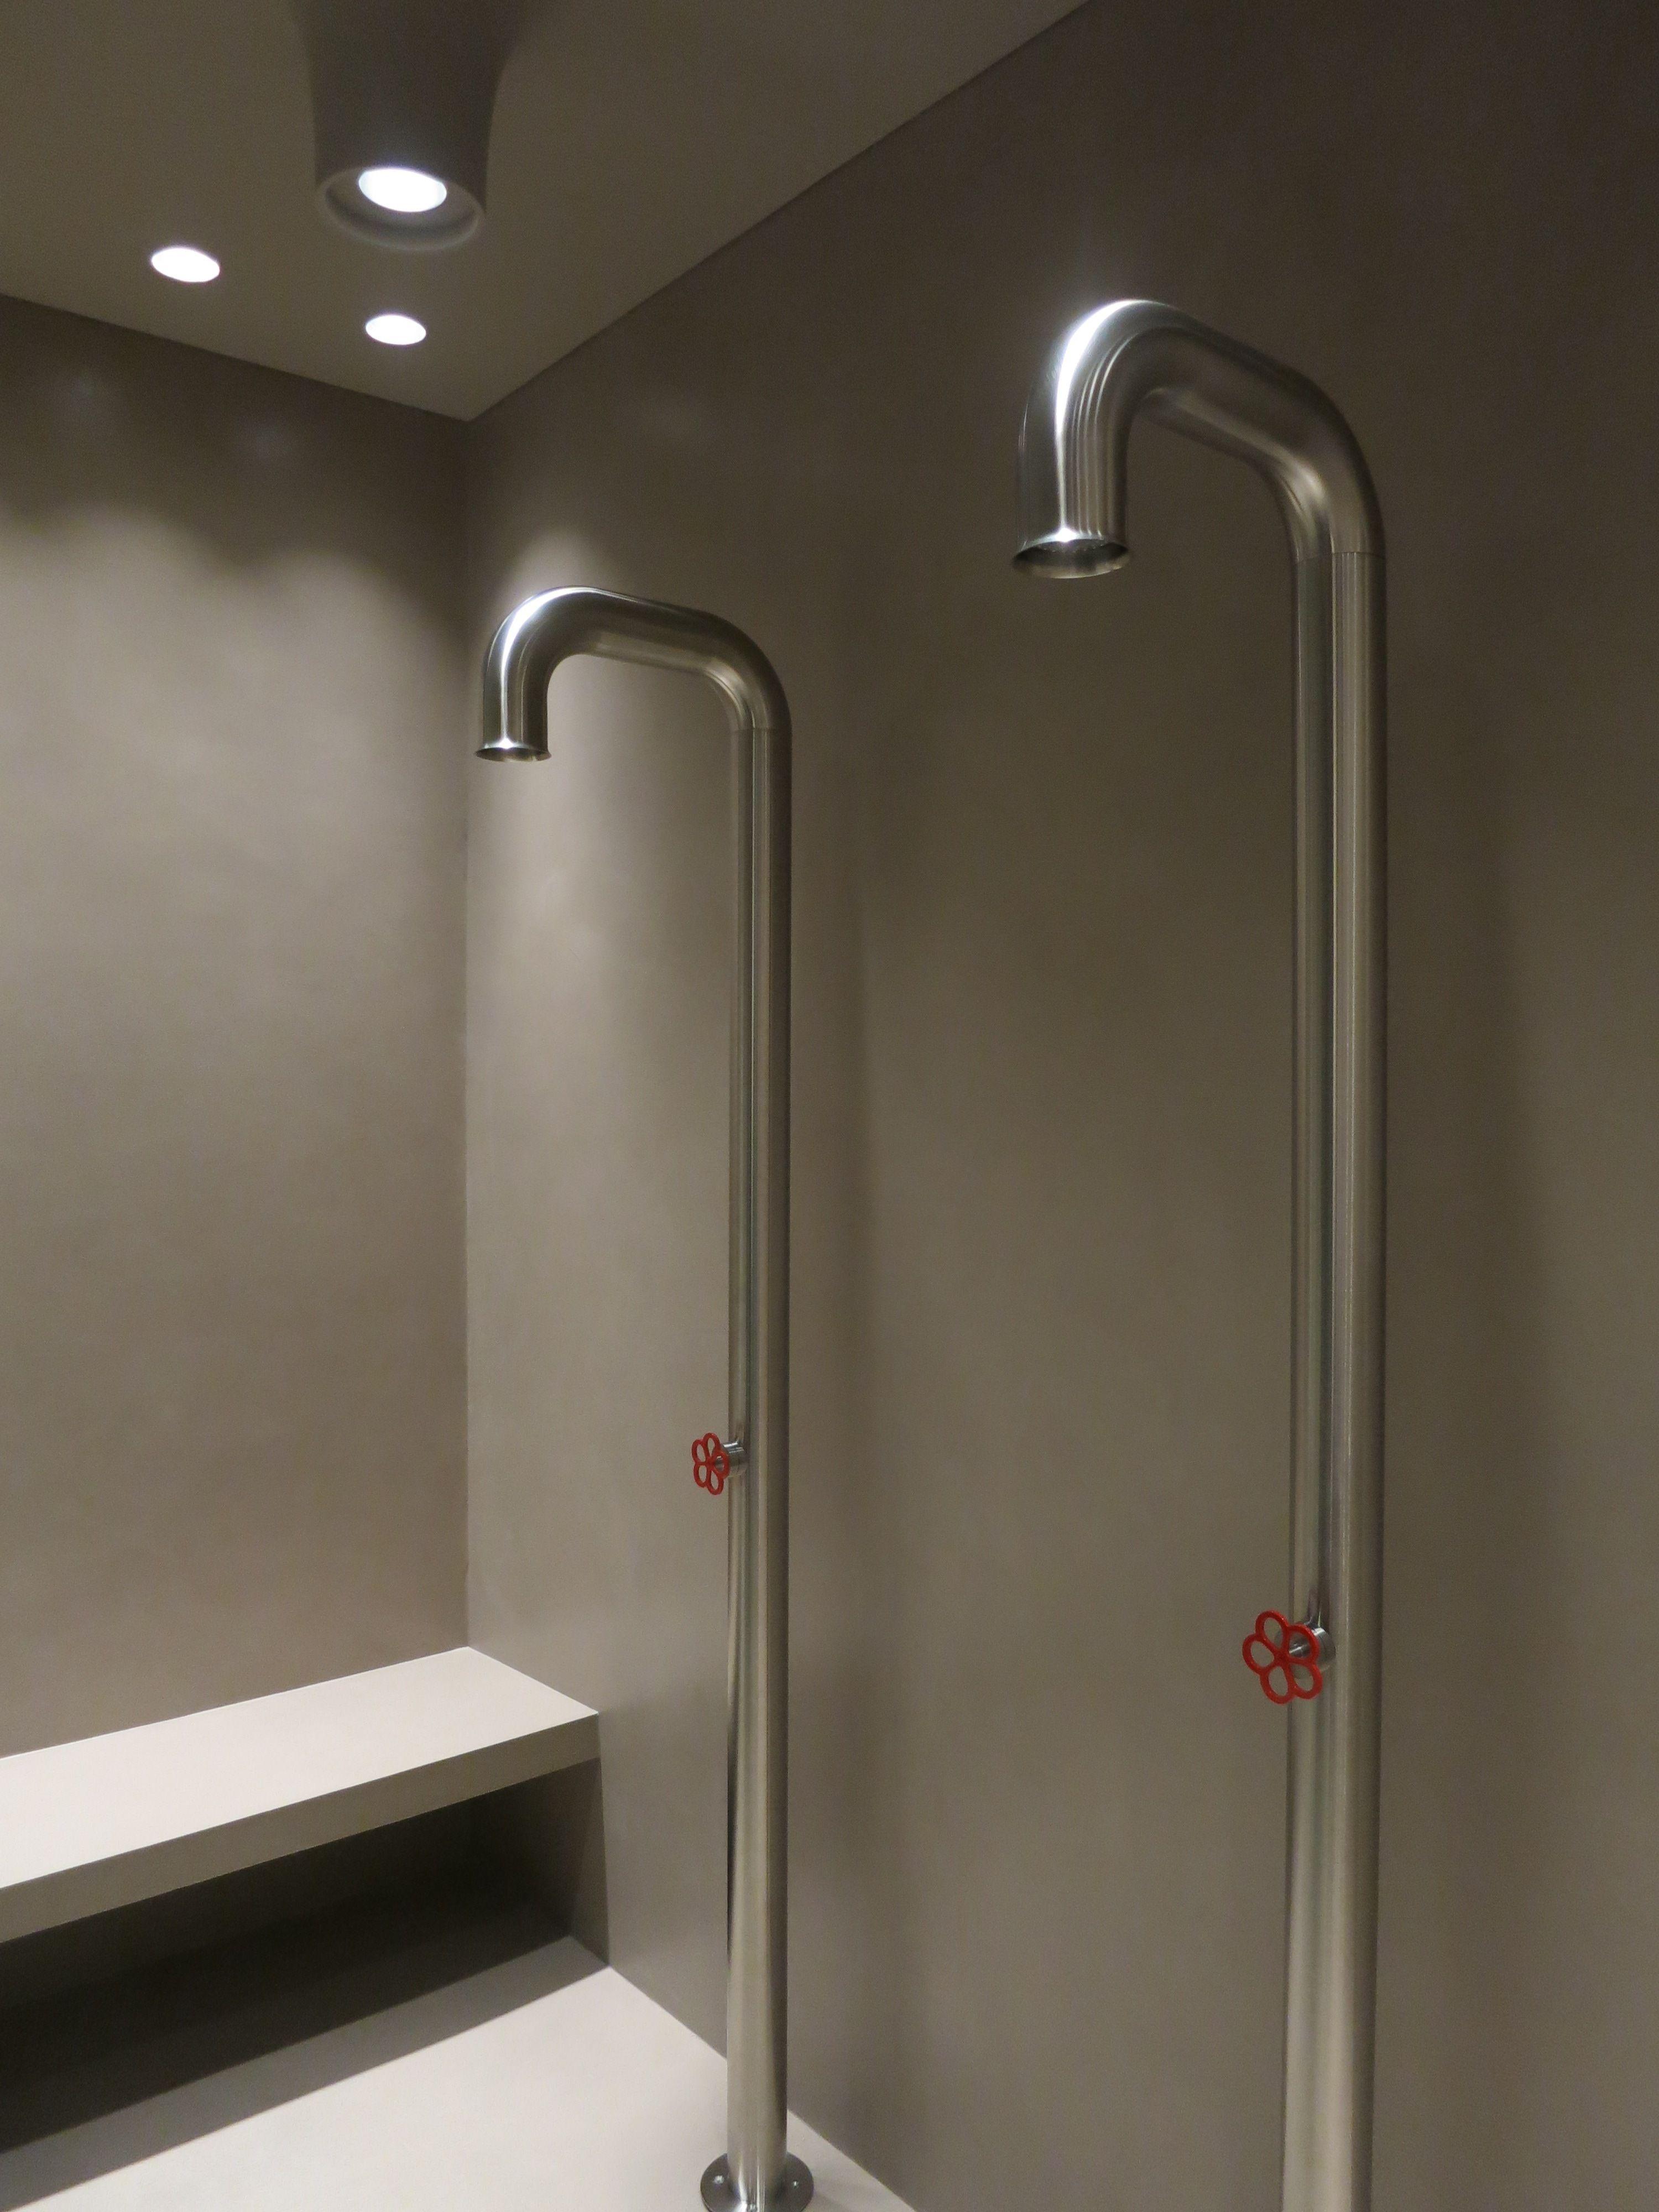 Bathroom shower pipe - Docce Pipe Boffi Rivestimento Resina Www Stanzedautore It